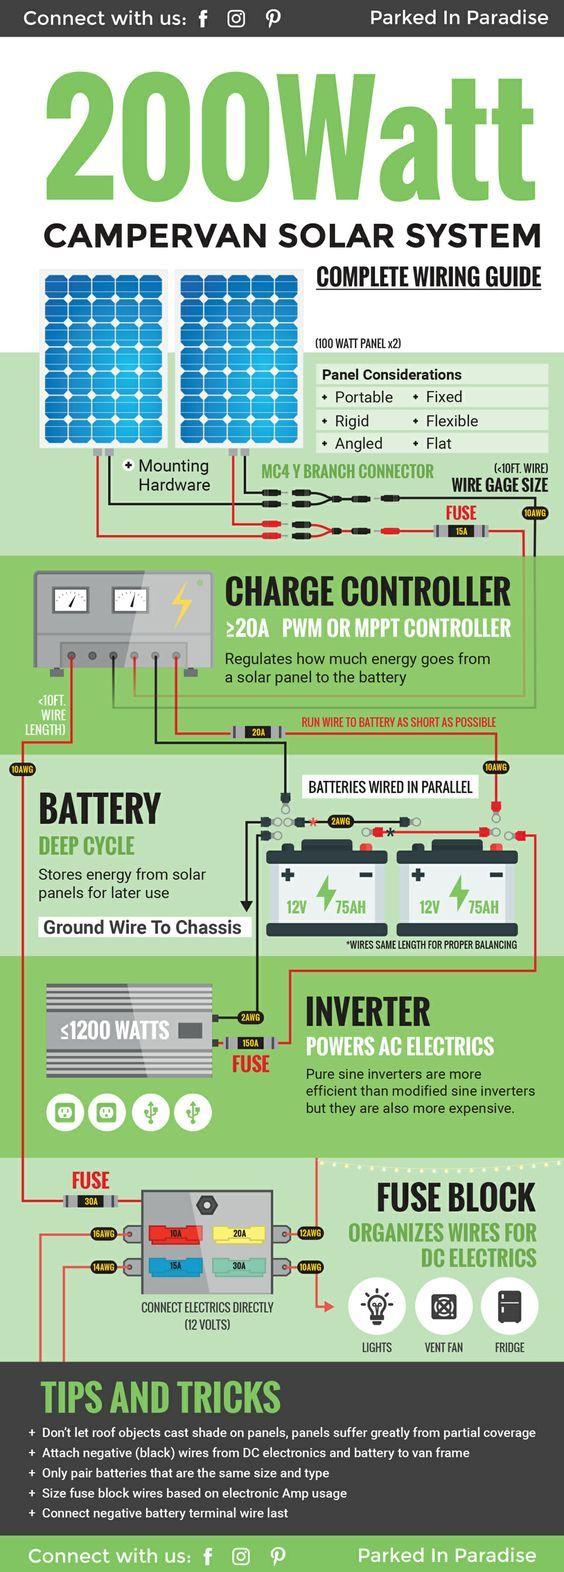 solar calculator and diy wiring diagrams vw lt 35 motorhome upgrade solar panel system campervan solar panels [ 564 x 1572 Pixel ]